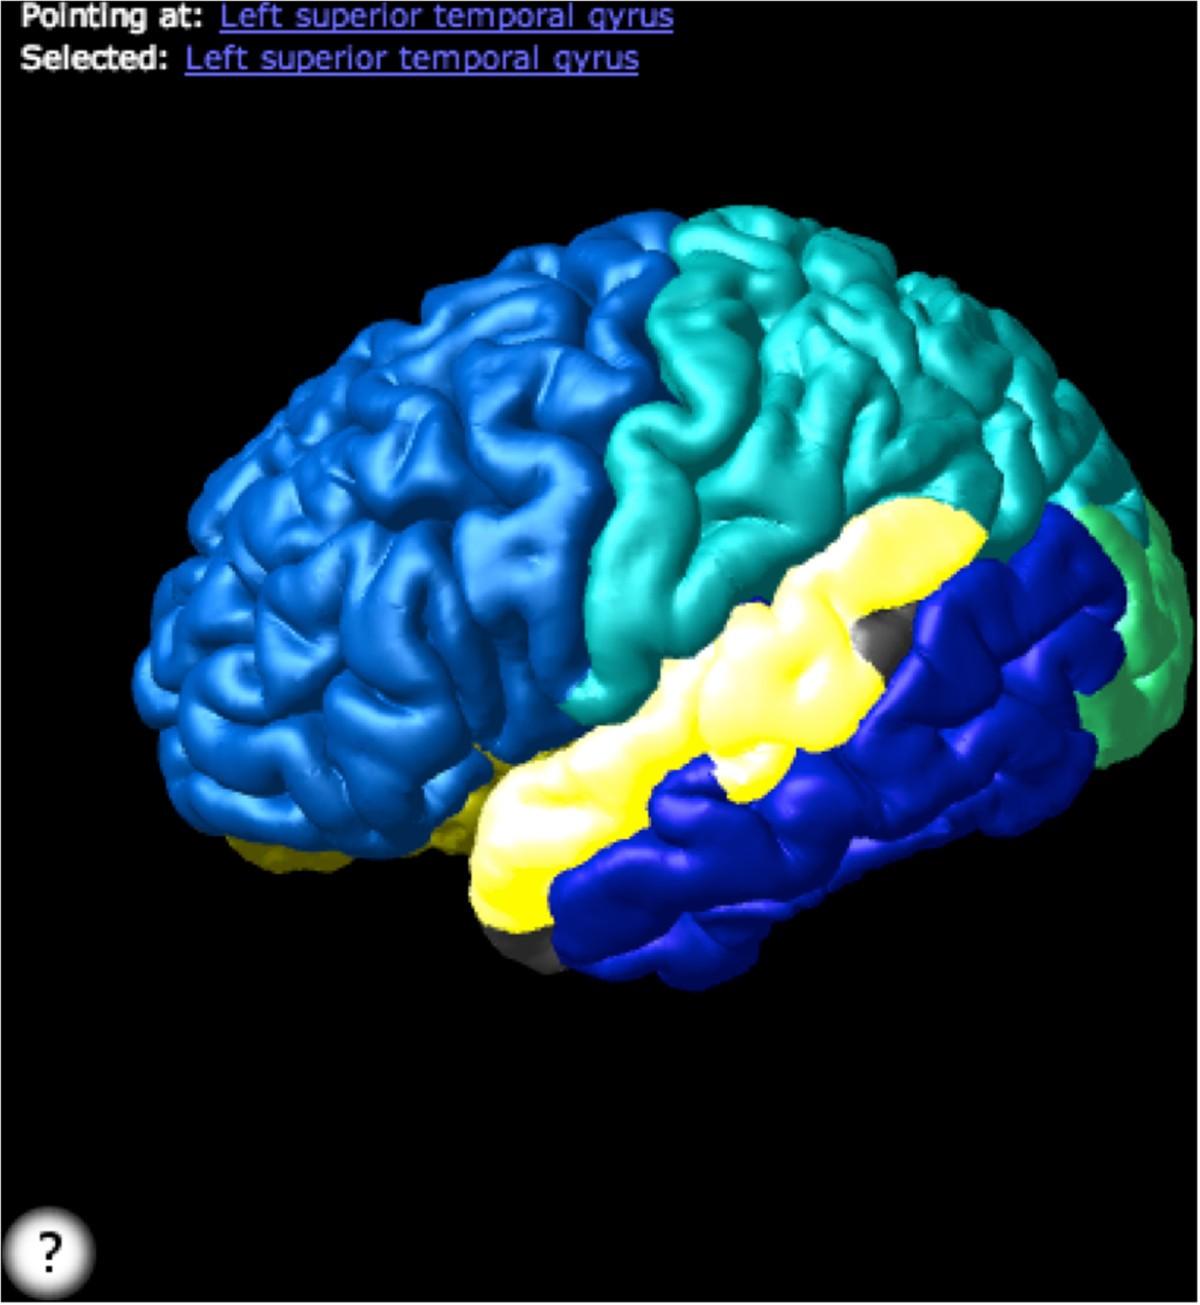 Neuroanatomical domain of the foundational model of anatomy ontology ...